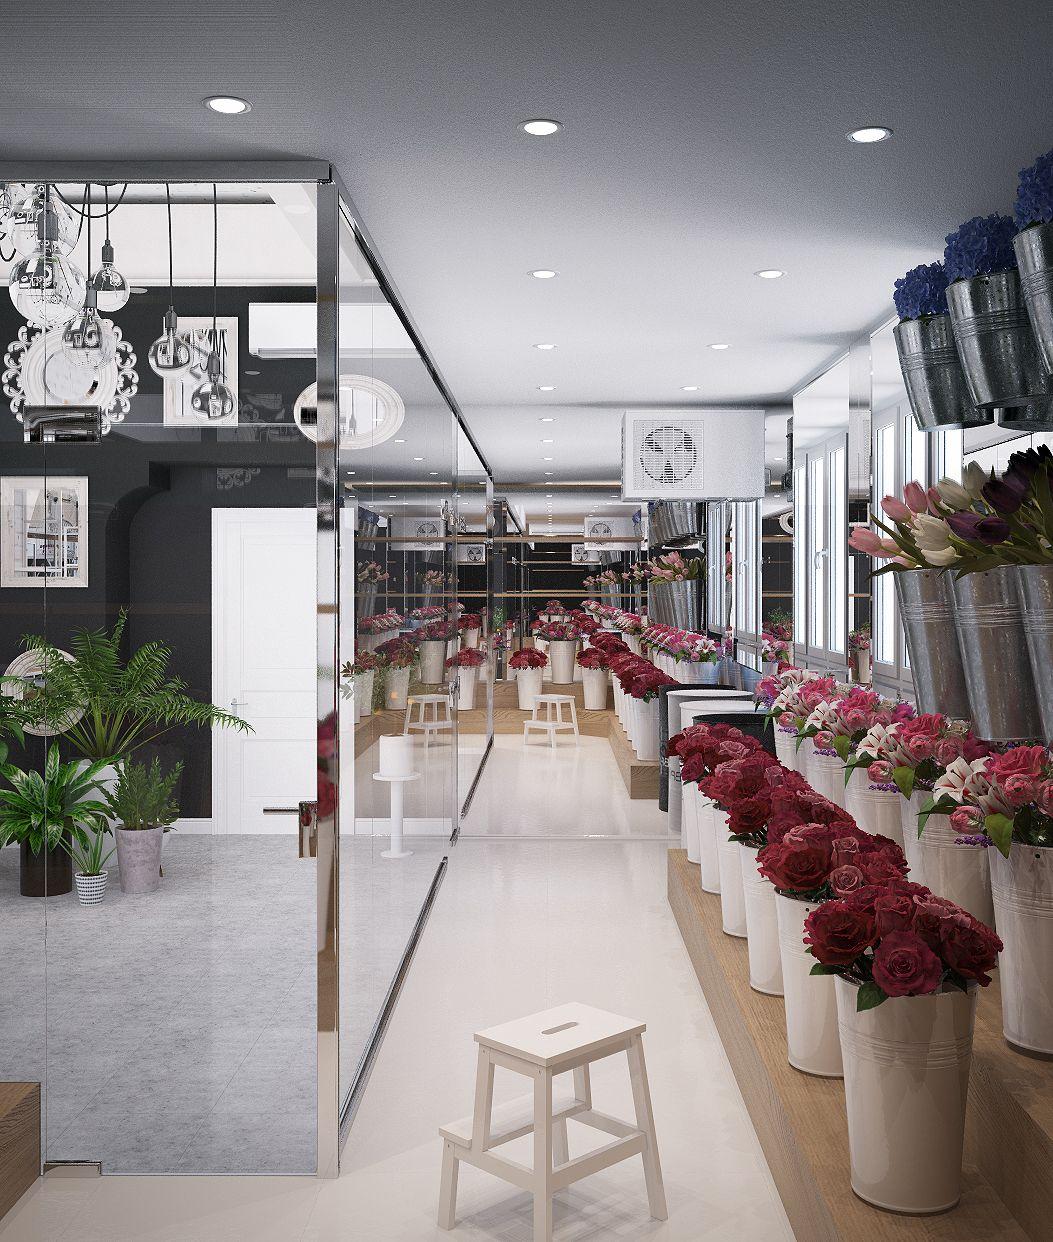 Интерьер цветочного магазина стиле лофт on Behance